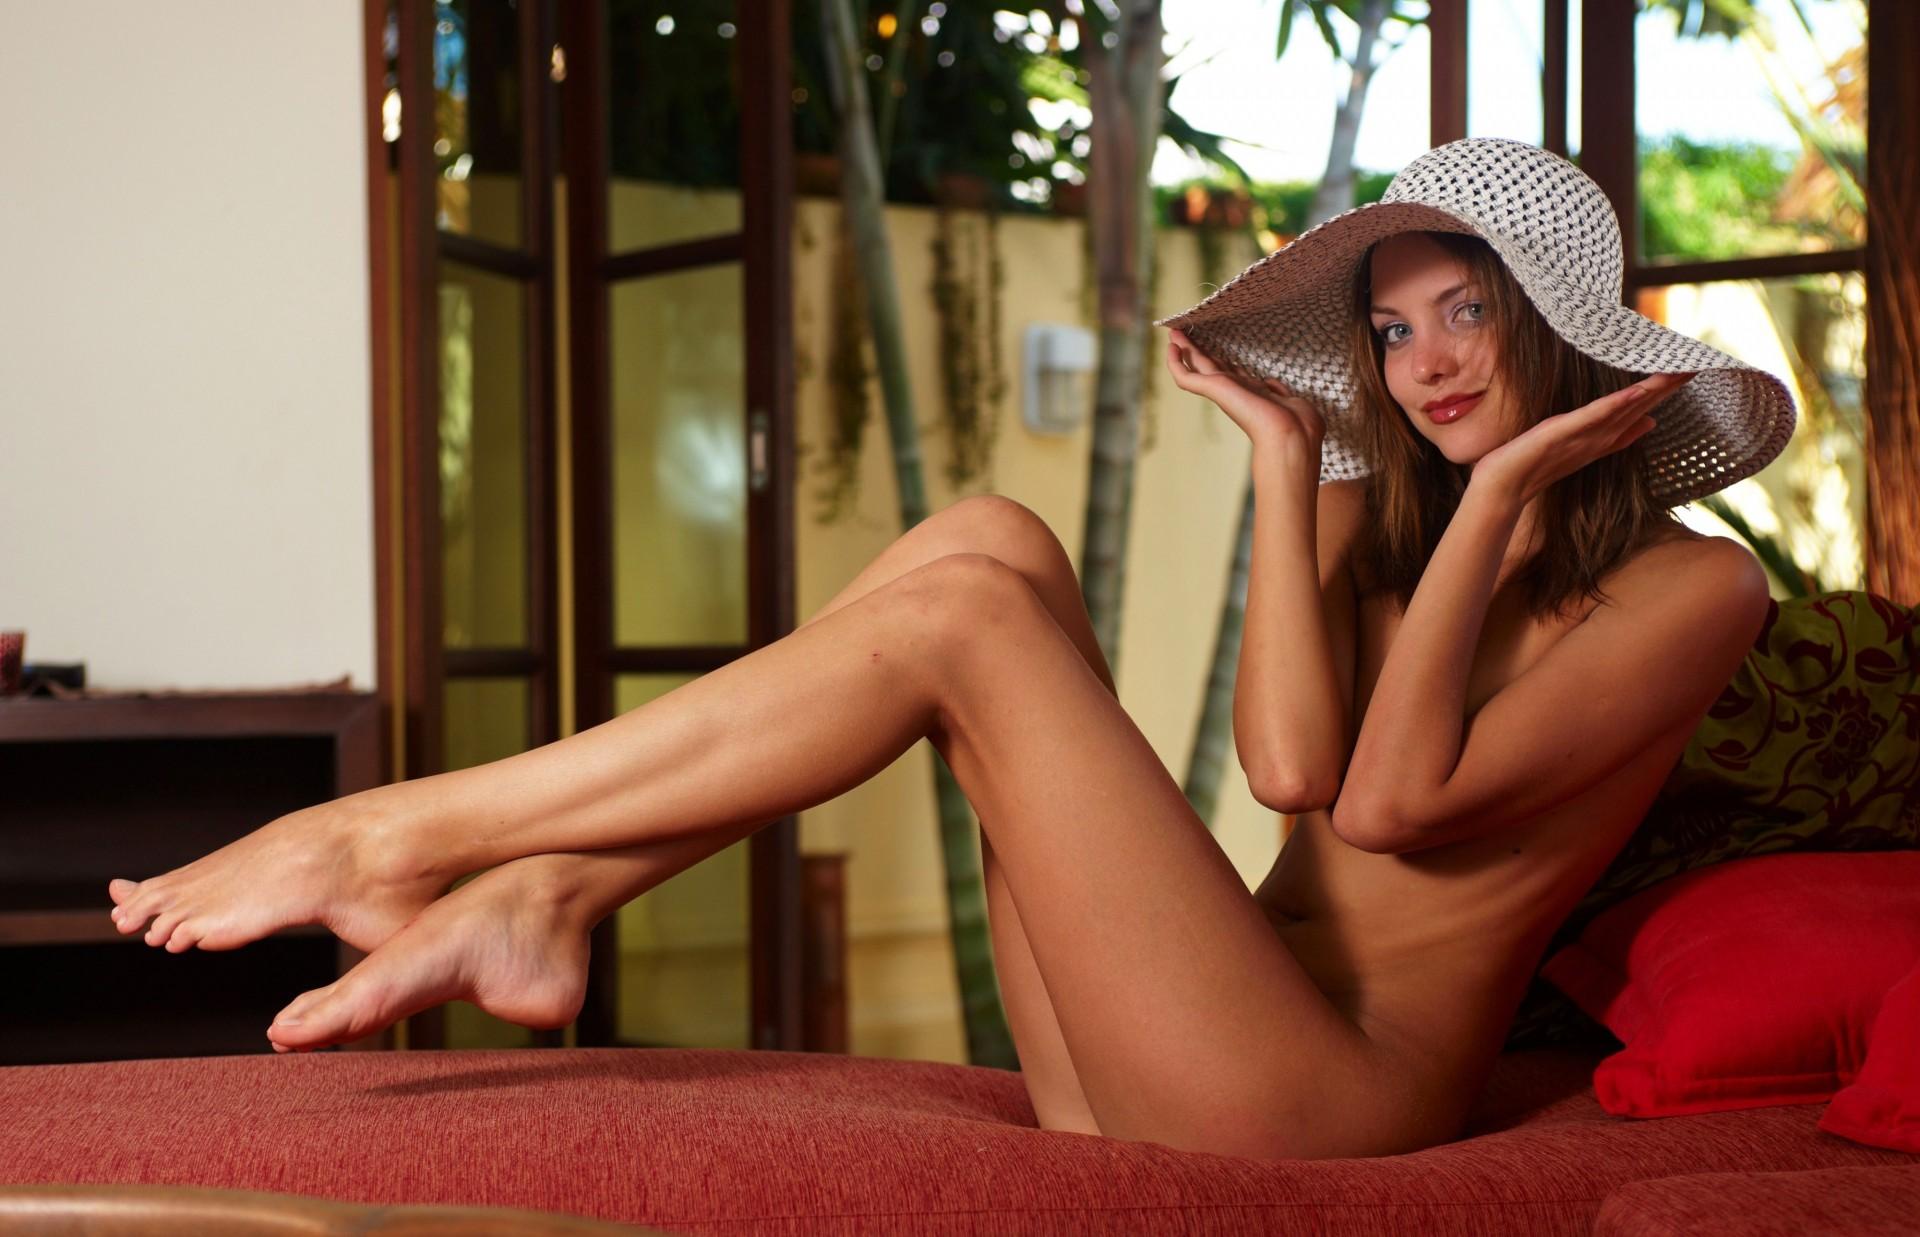 Dengan skinny girls barefoot and naked female bent hermaphrodite